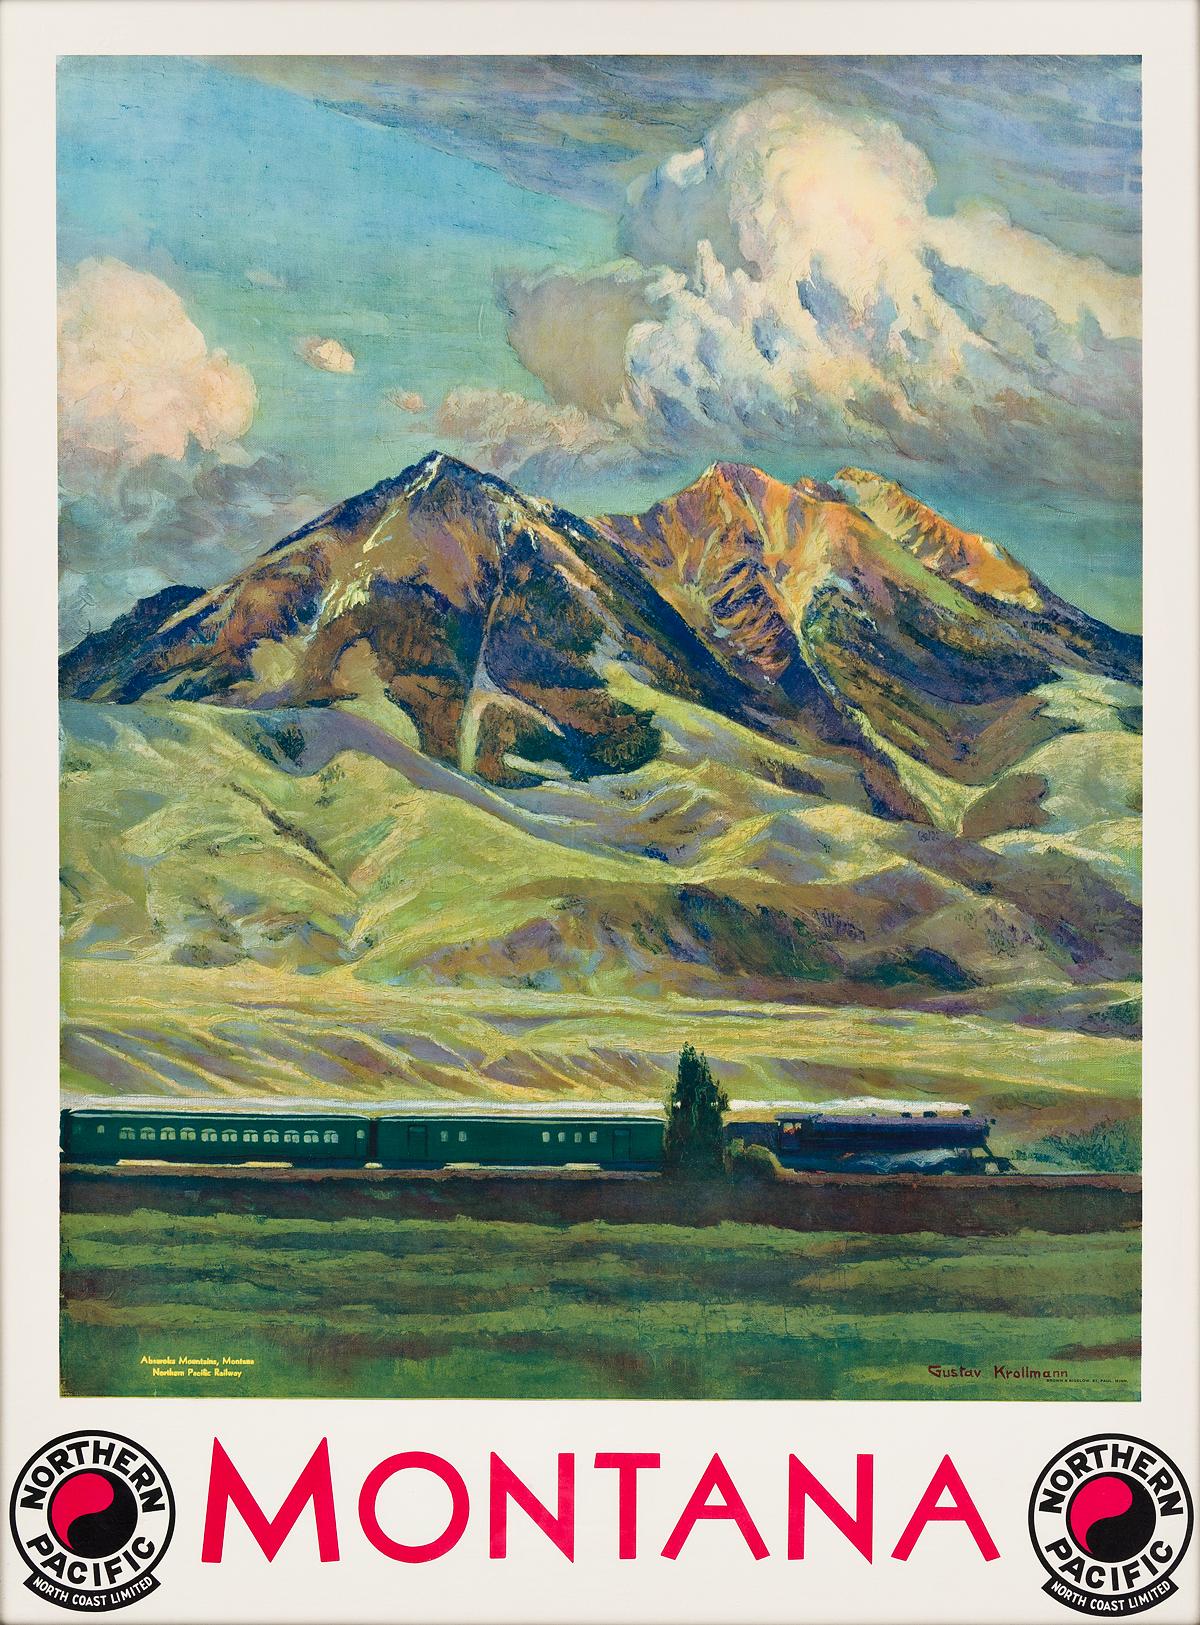 GUSTAV-W-KROLLMAN-(1888-1962)-MONTANA--NORTHERN-PACIFIC-Circa-1930-39x28-inches-99x73-cm-Brown--Bigelow-St-Paul